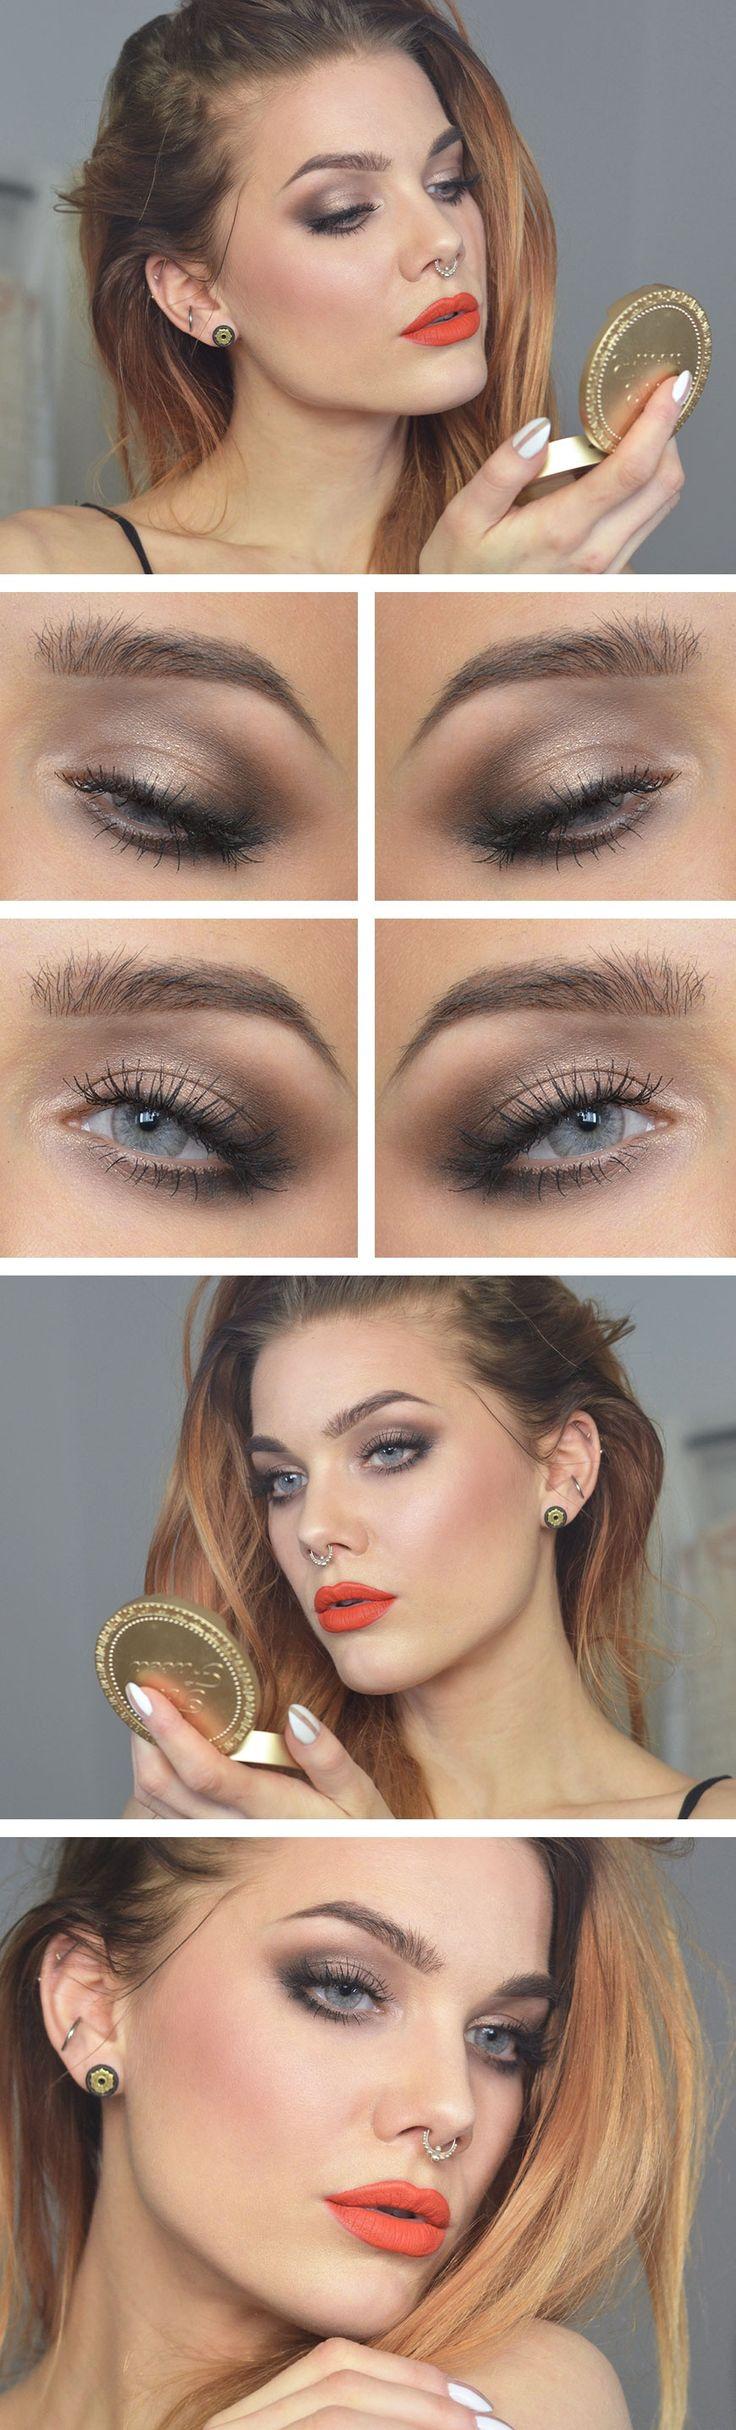 Benefit Creaseless Cream Shadow - No Pressure The Balm - Balsmsai Eyeshadow & Brow